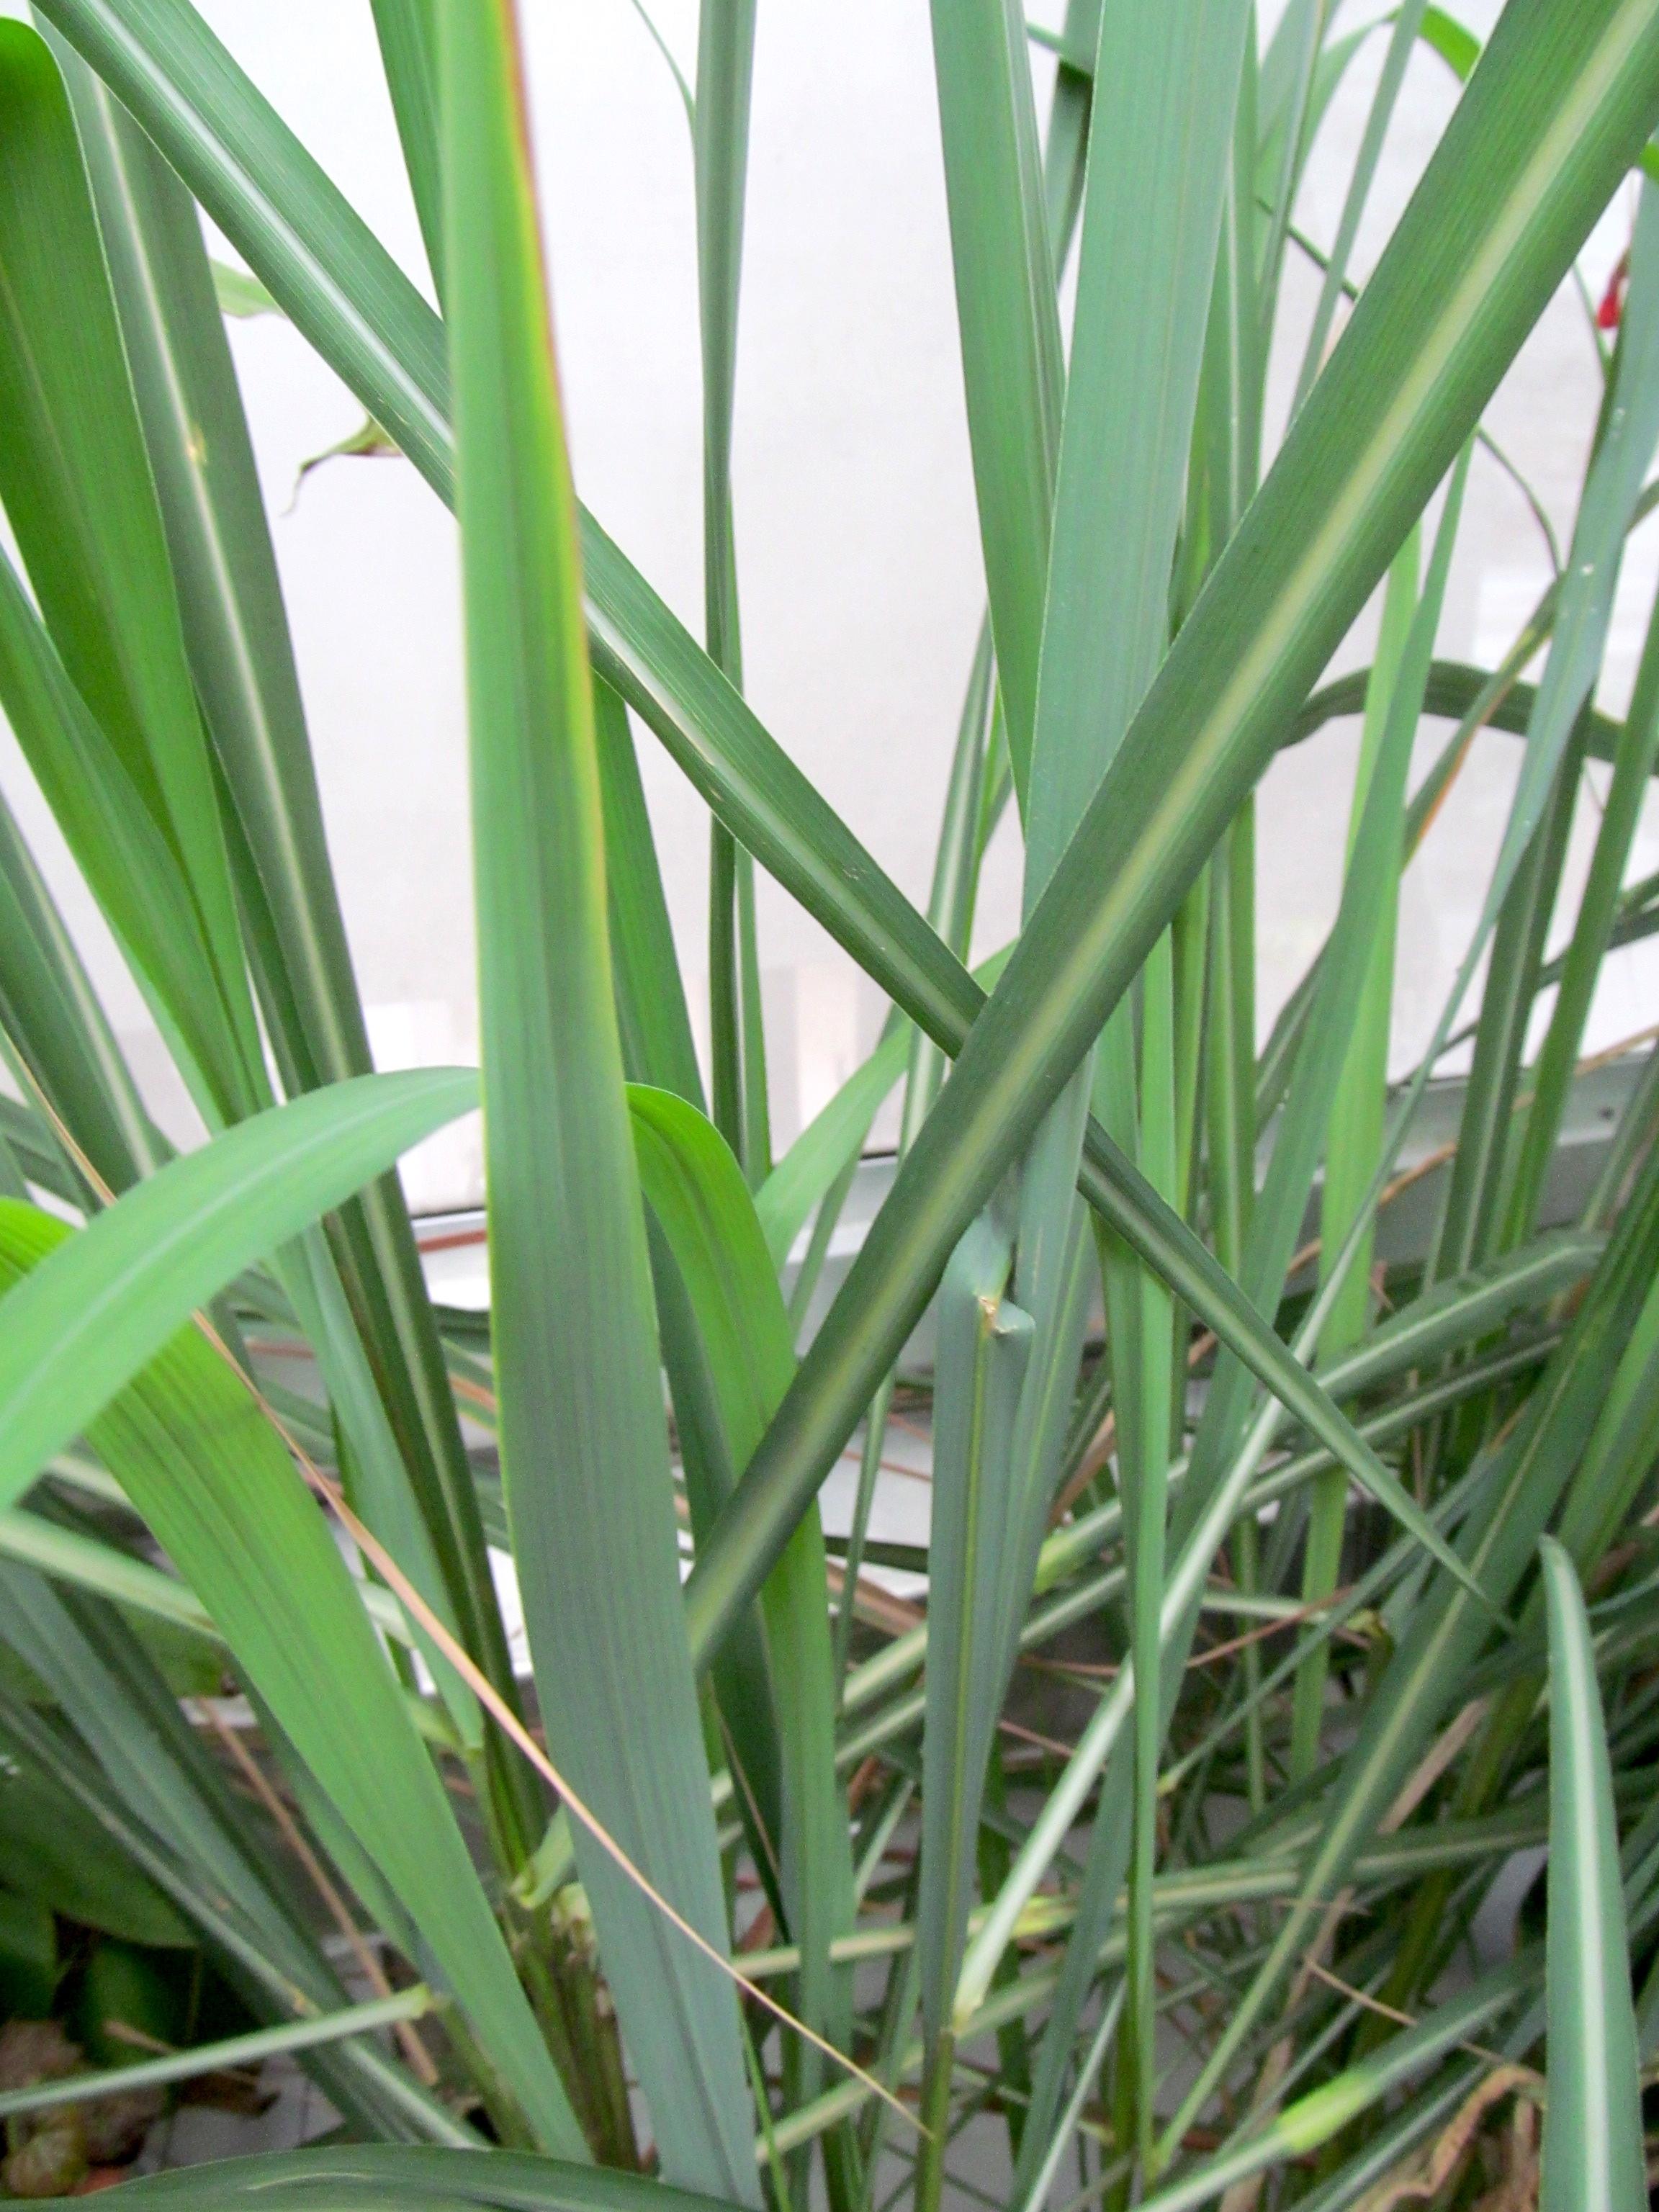 Growing Lemongrass Indoors